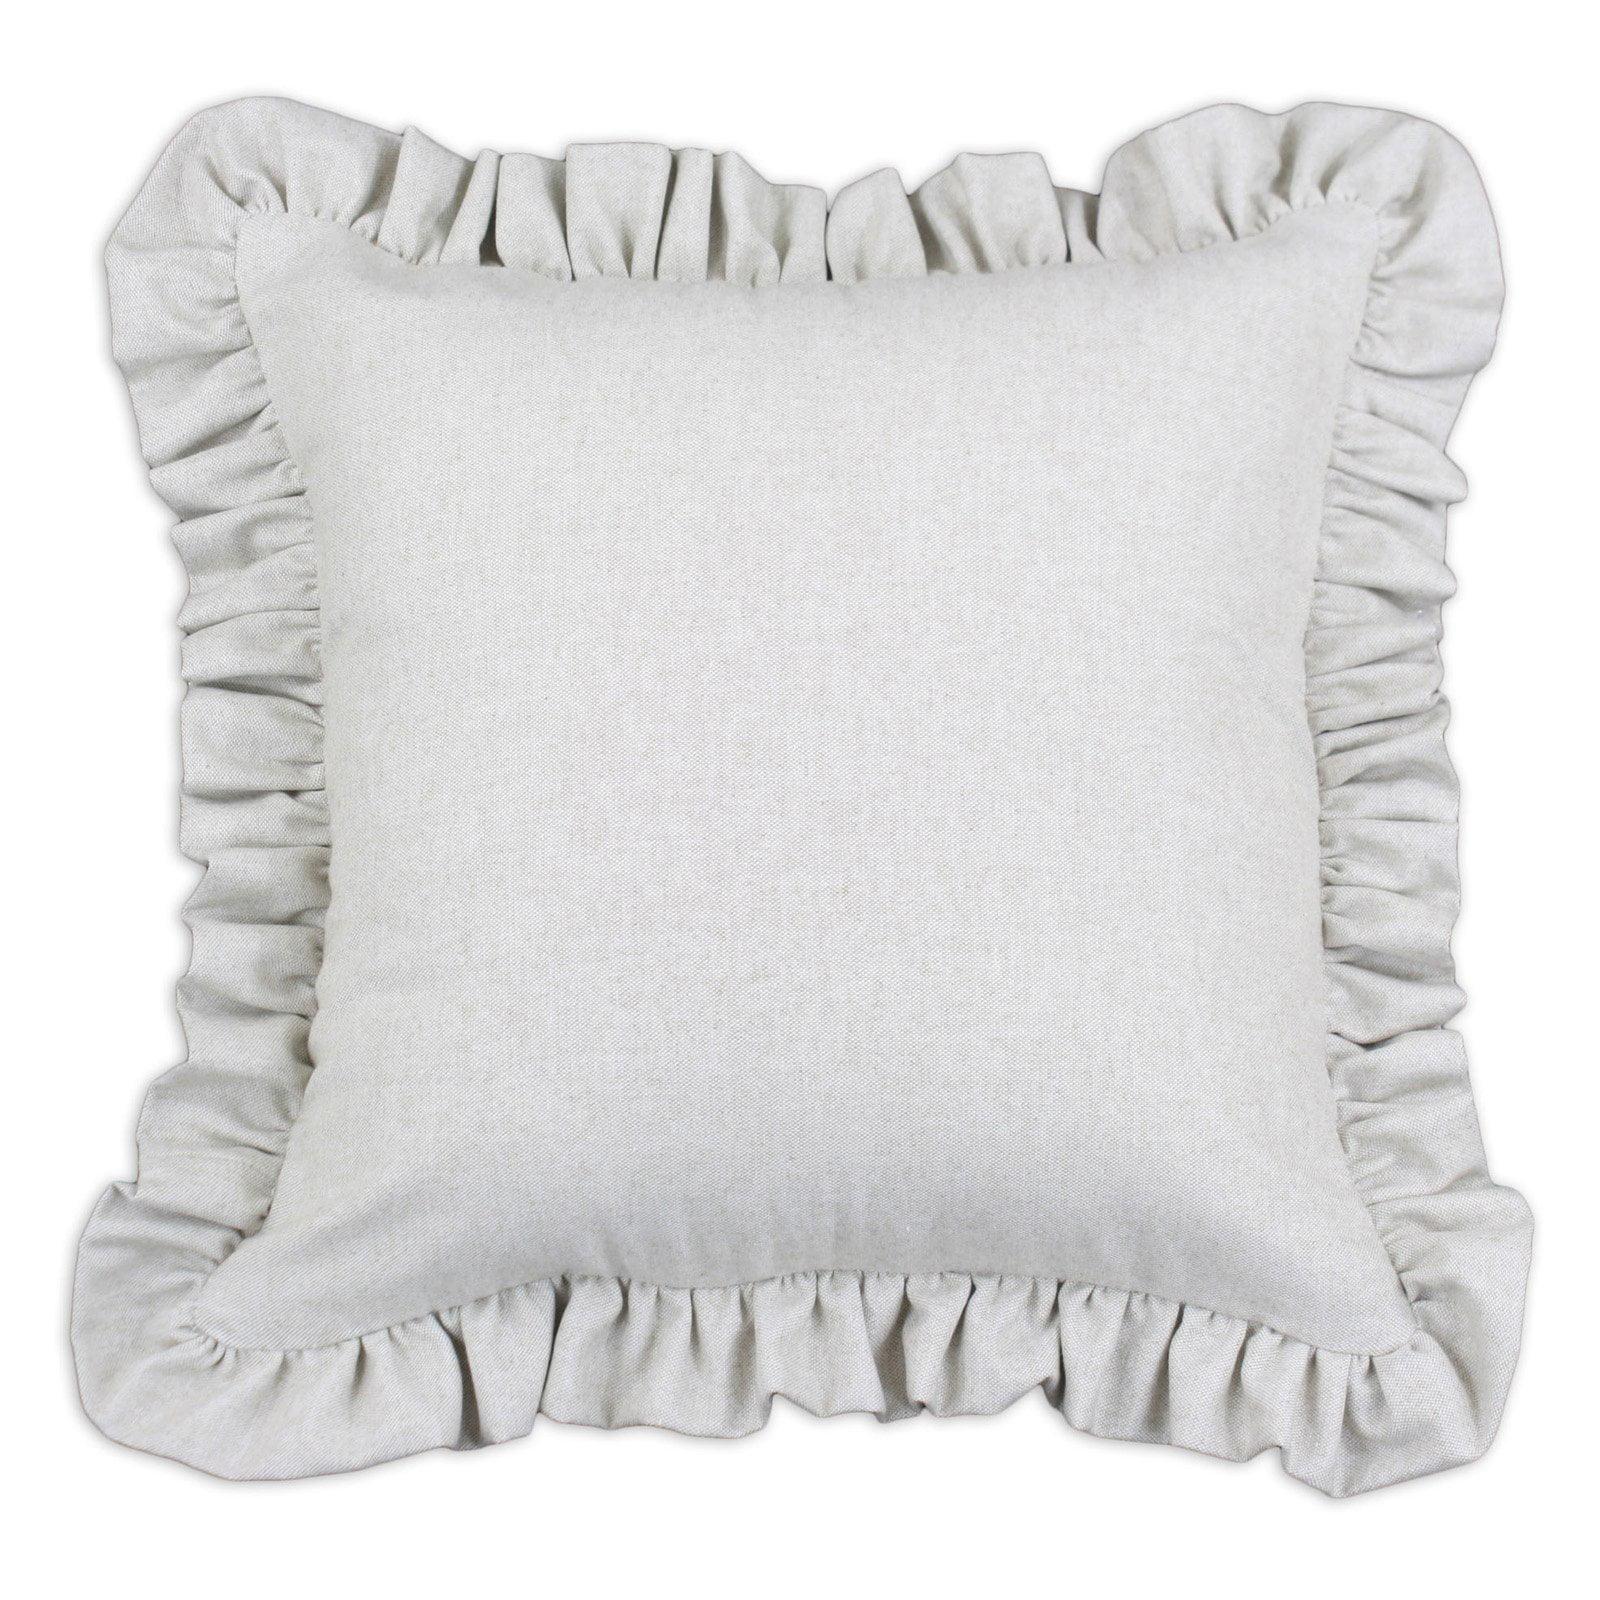 Brite Ideas Living Saxony Natural Ruffle D-Fiber Pillow